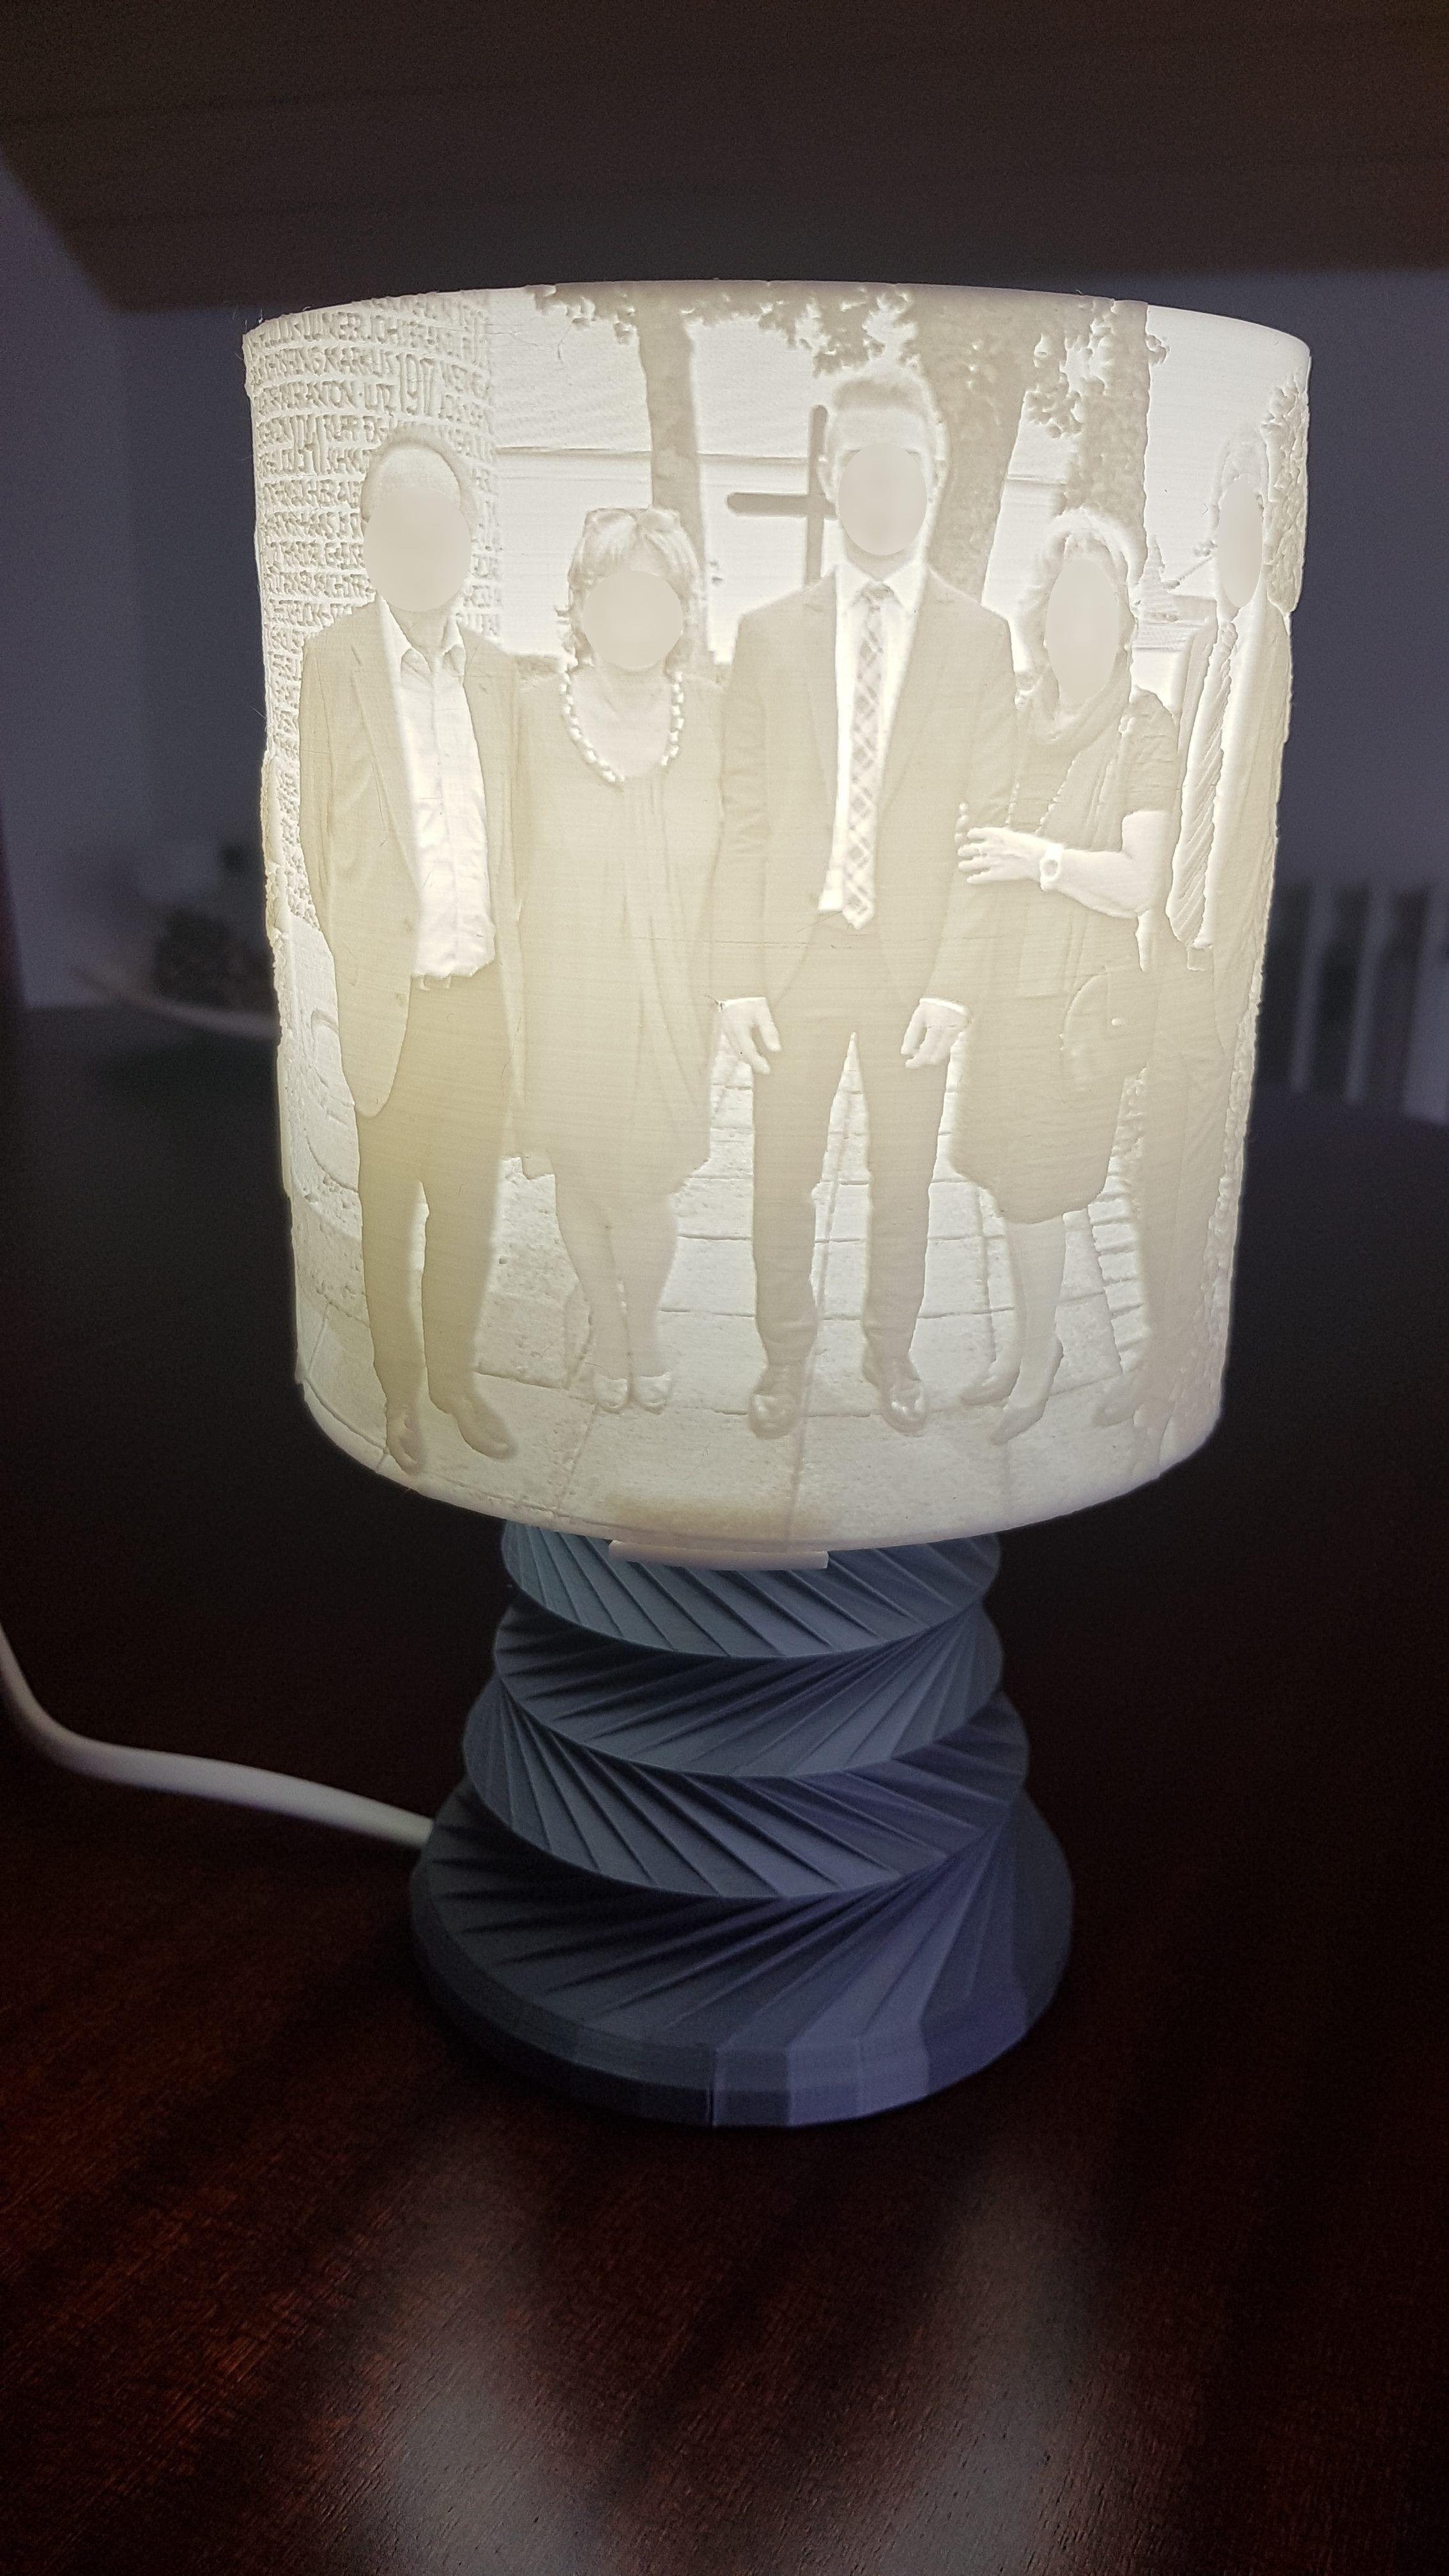 Lithophane Rgb Led Lamp Model Tutorial By Julien Dacosta Thingiverse Lamp Led Lamp Rgb Led